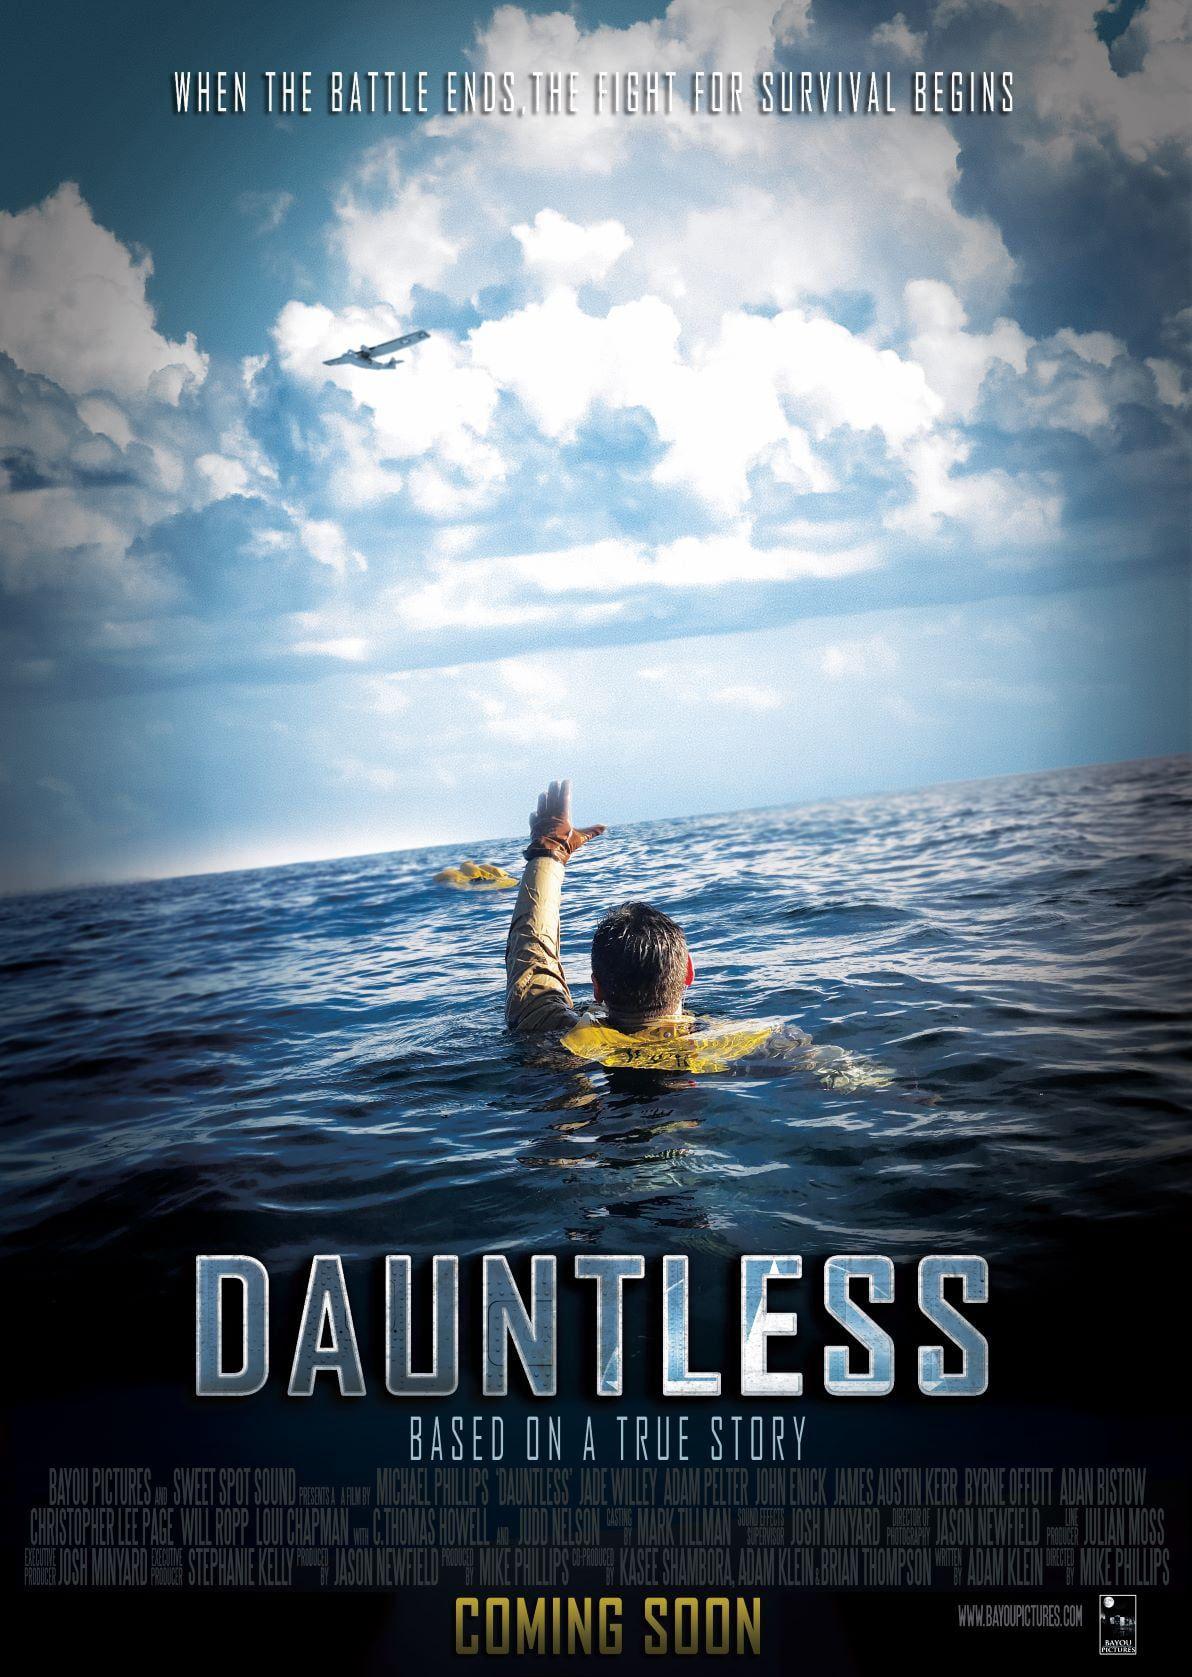 Dauntless Fullfore Film Dubbet Em Portugues 720p Hd Midway Movie Dauntless Battle